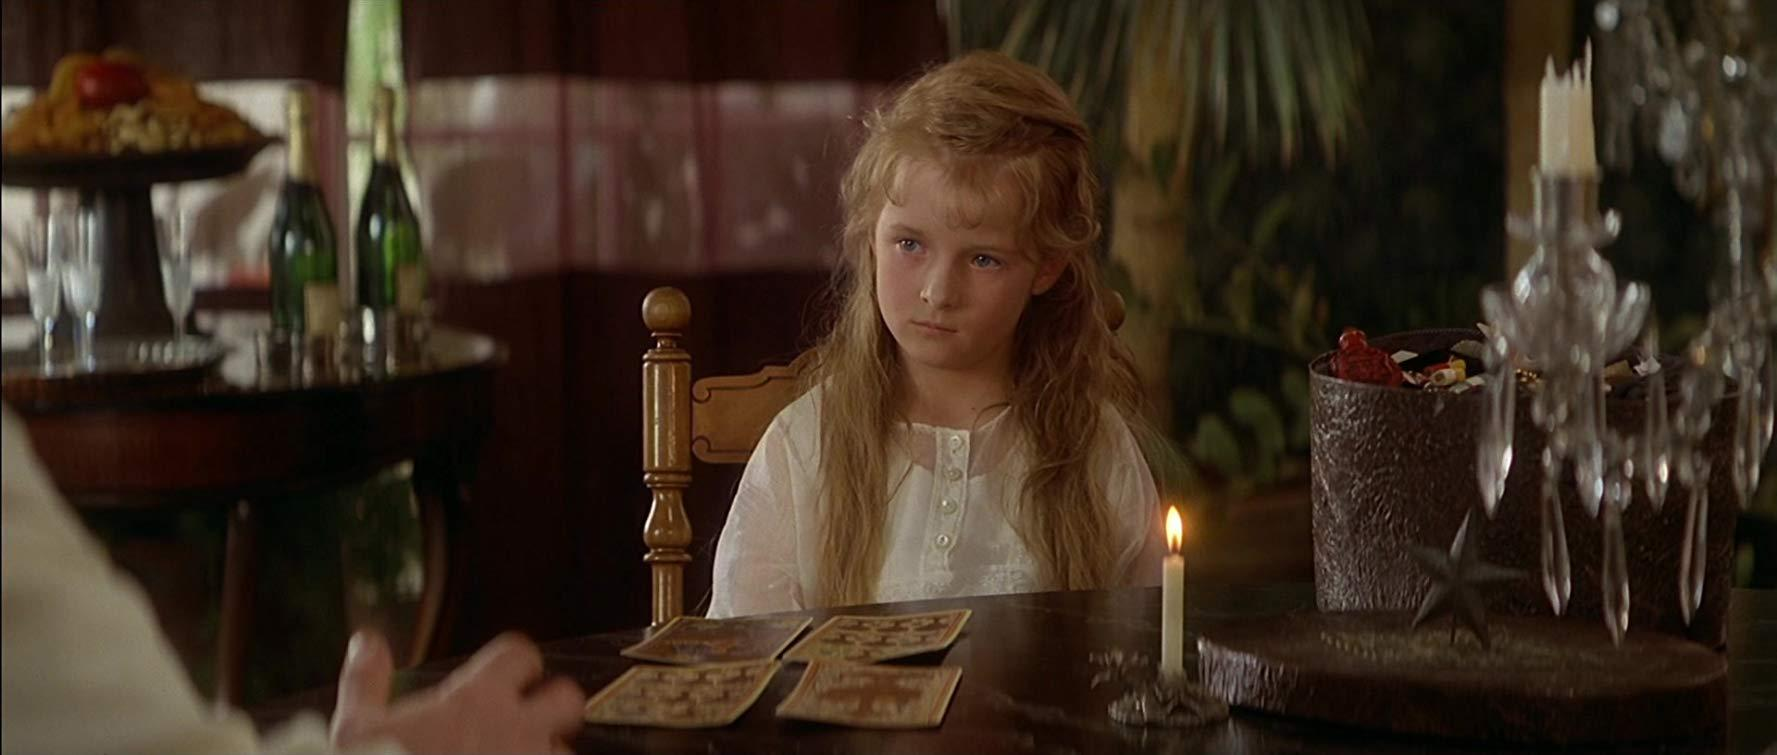 فيلم The House Of The Spirits 1993 مترجم